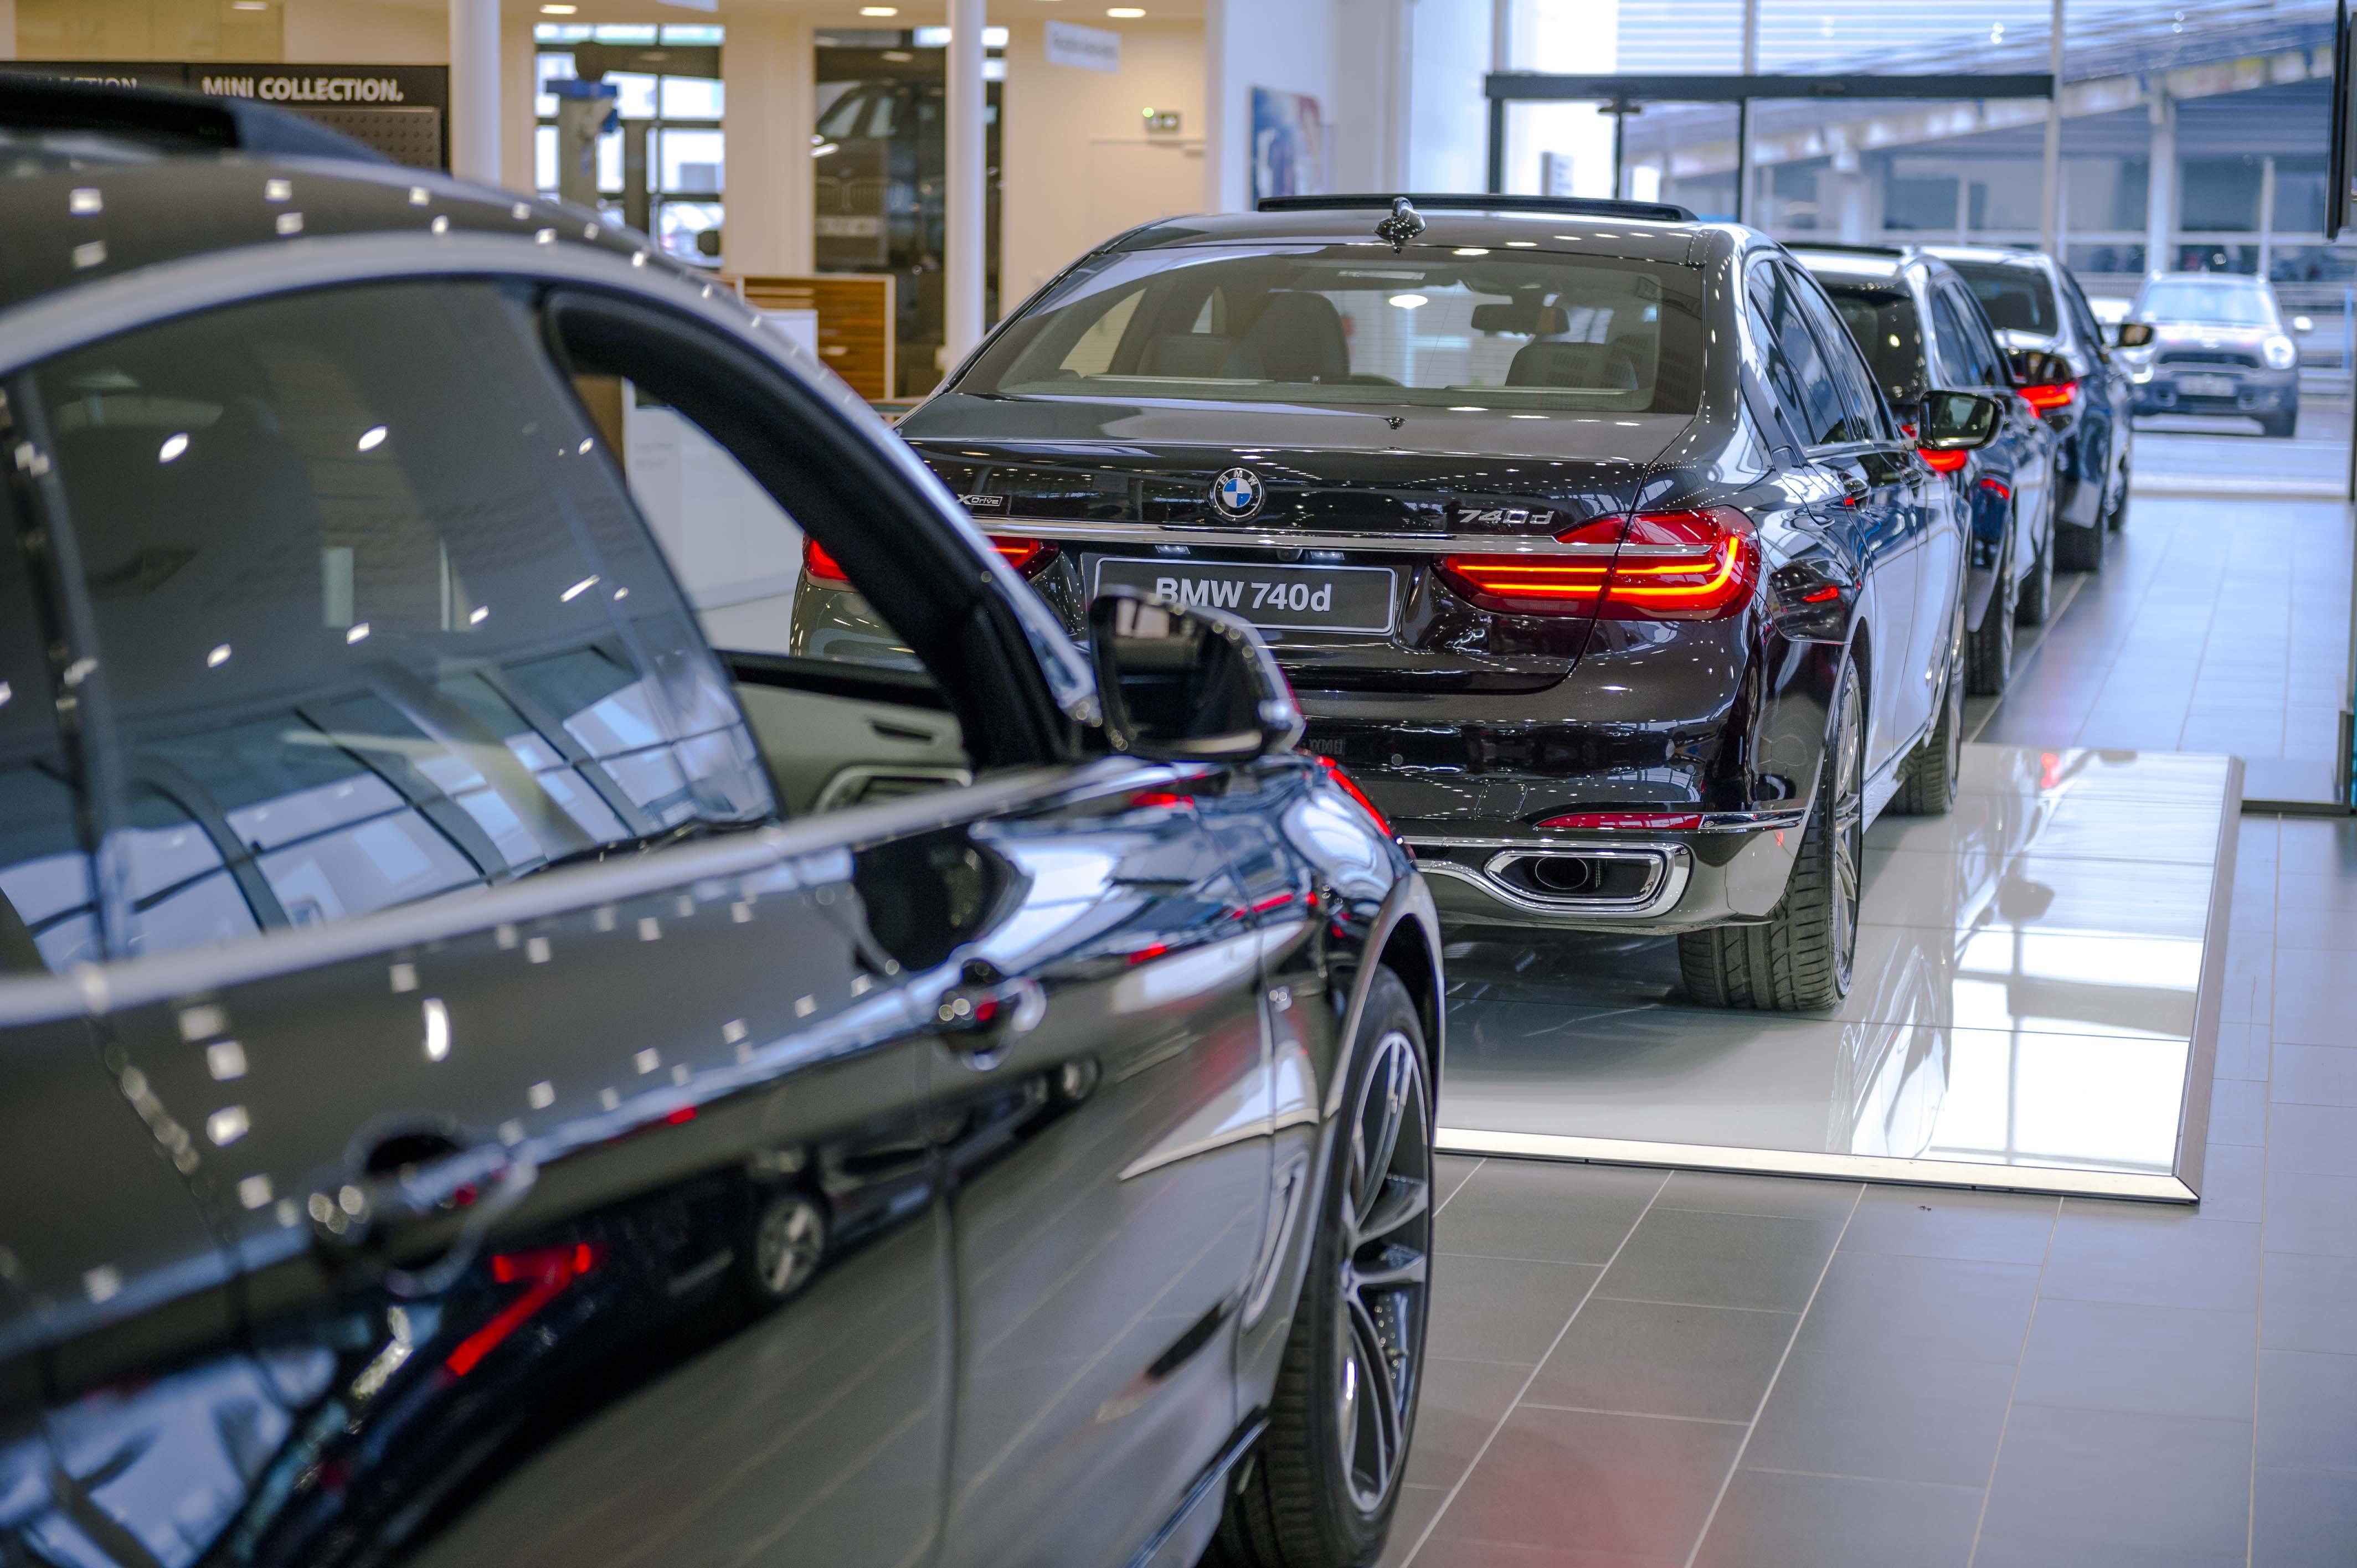 BMW MINI SAINT MERRI CHANTILLY